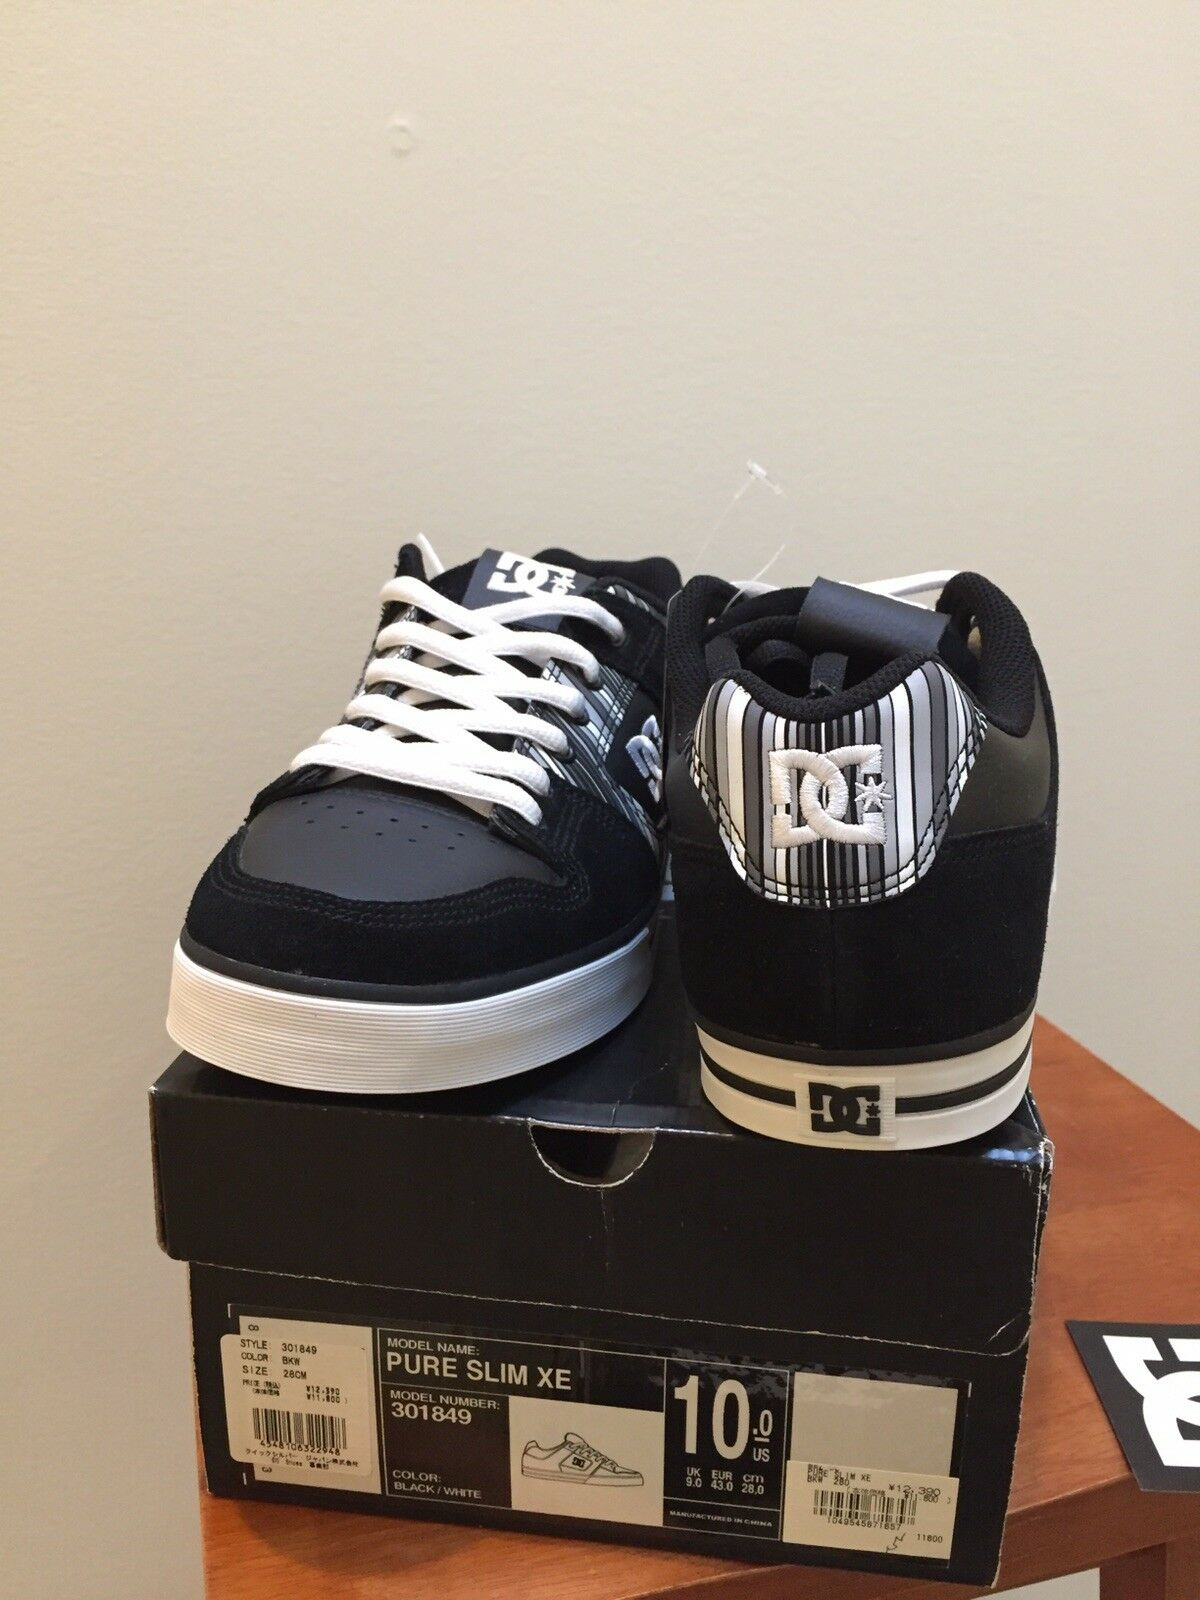 DC PURE SLIM XE 301849 (men's (men's (men's scarpe da ginnastica scarpe US10) DS Japan skateboarding e468a0